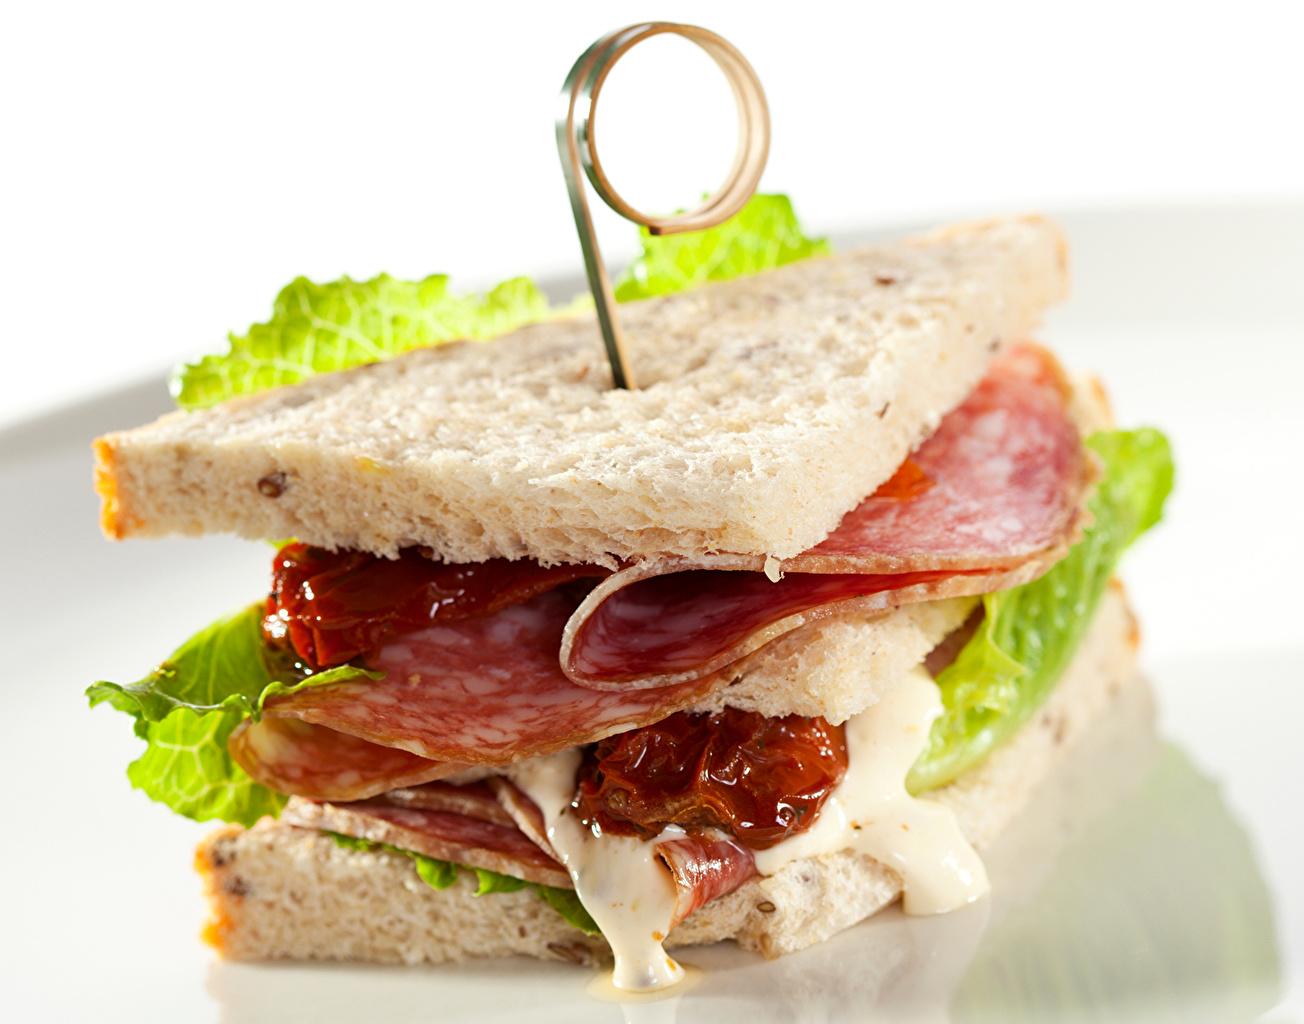 Картинка Еда Колбаса Хлеб Фастфуд бутерброд Сэндвич Пища Продукты питания Бутерброды Быстрое питание